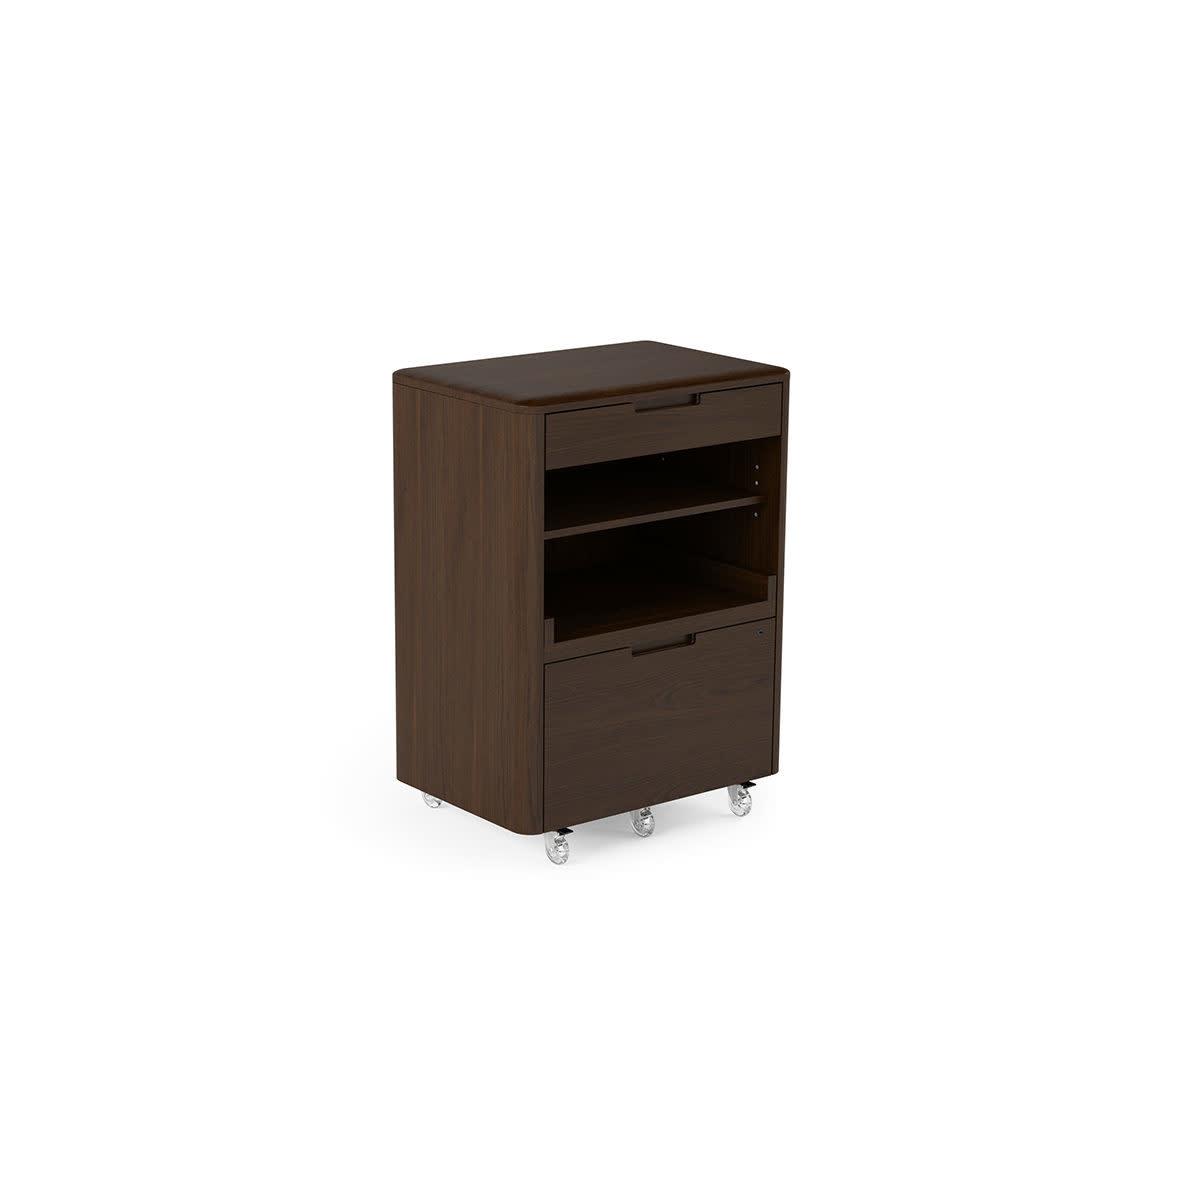 BDI Sola 6817 Multifunction Cabinet